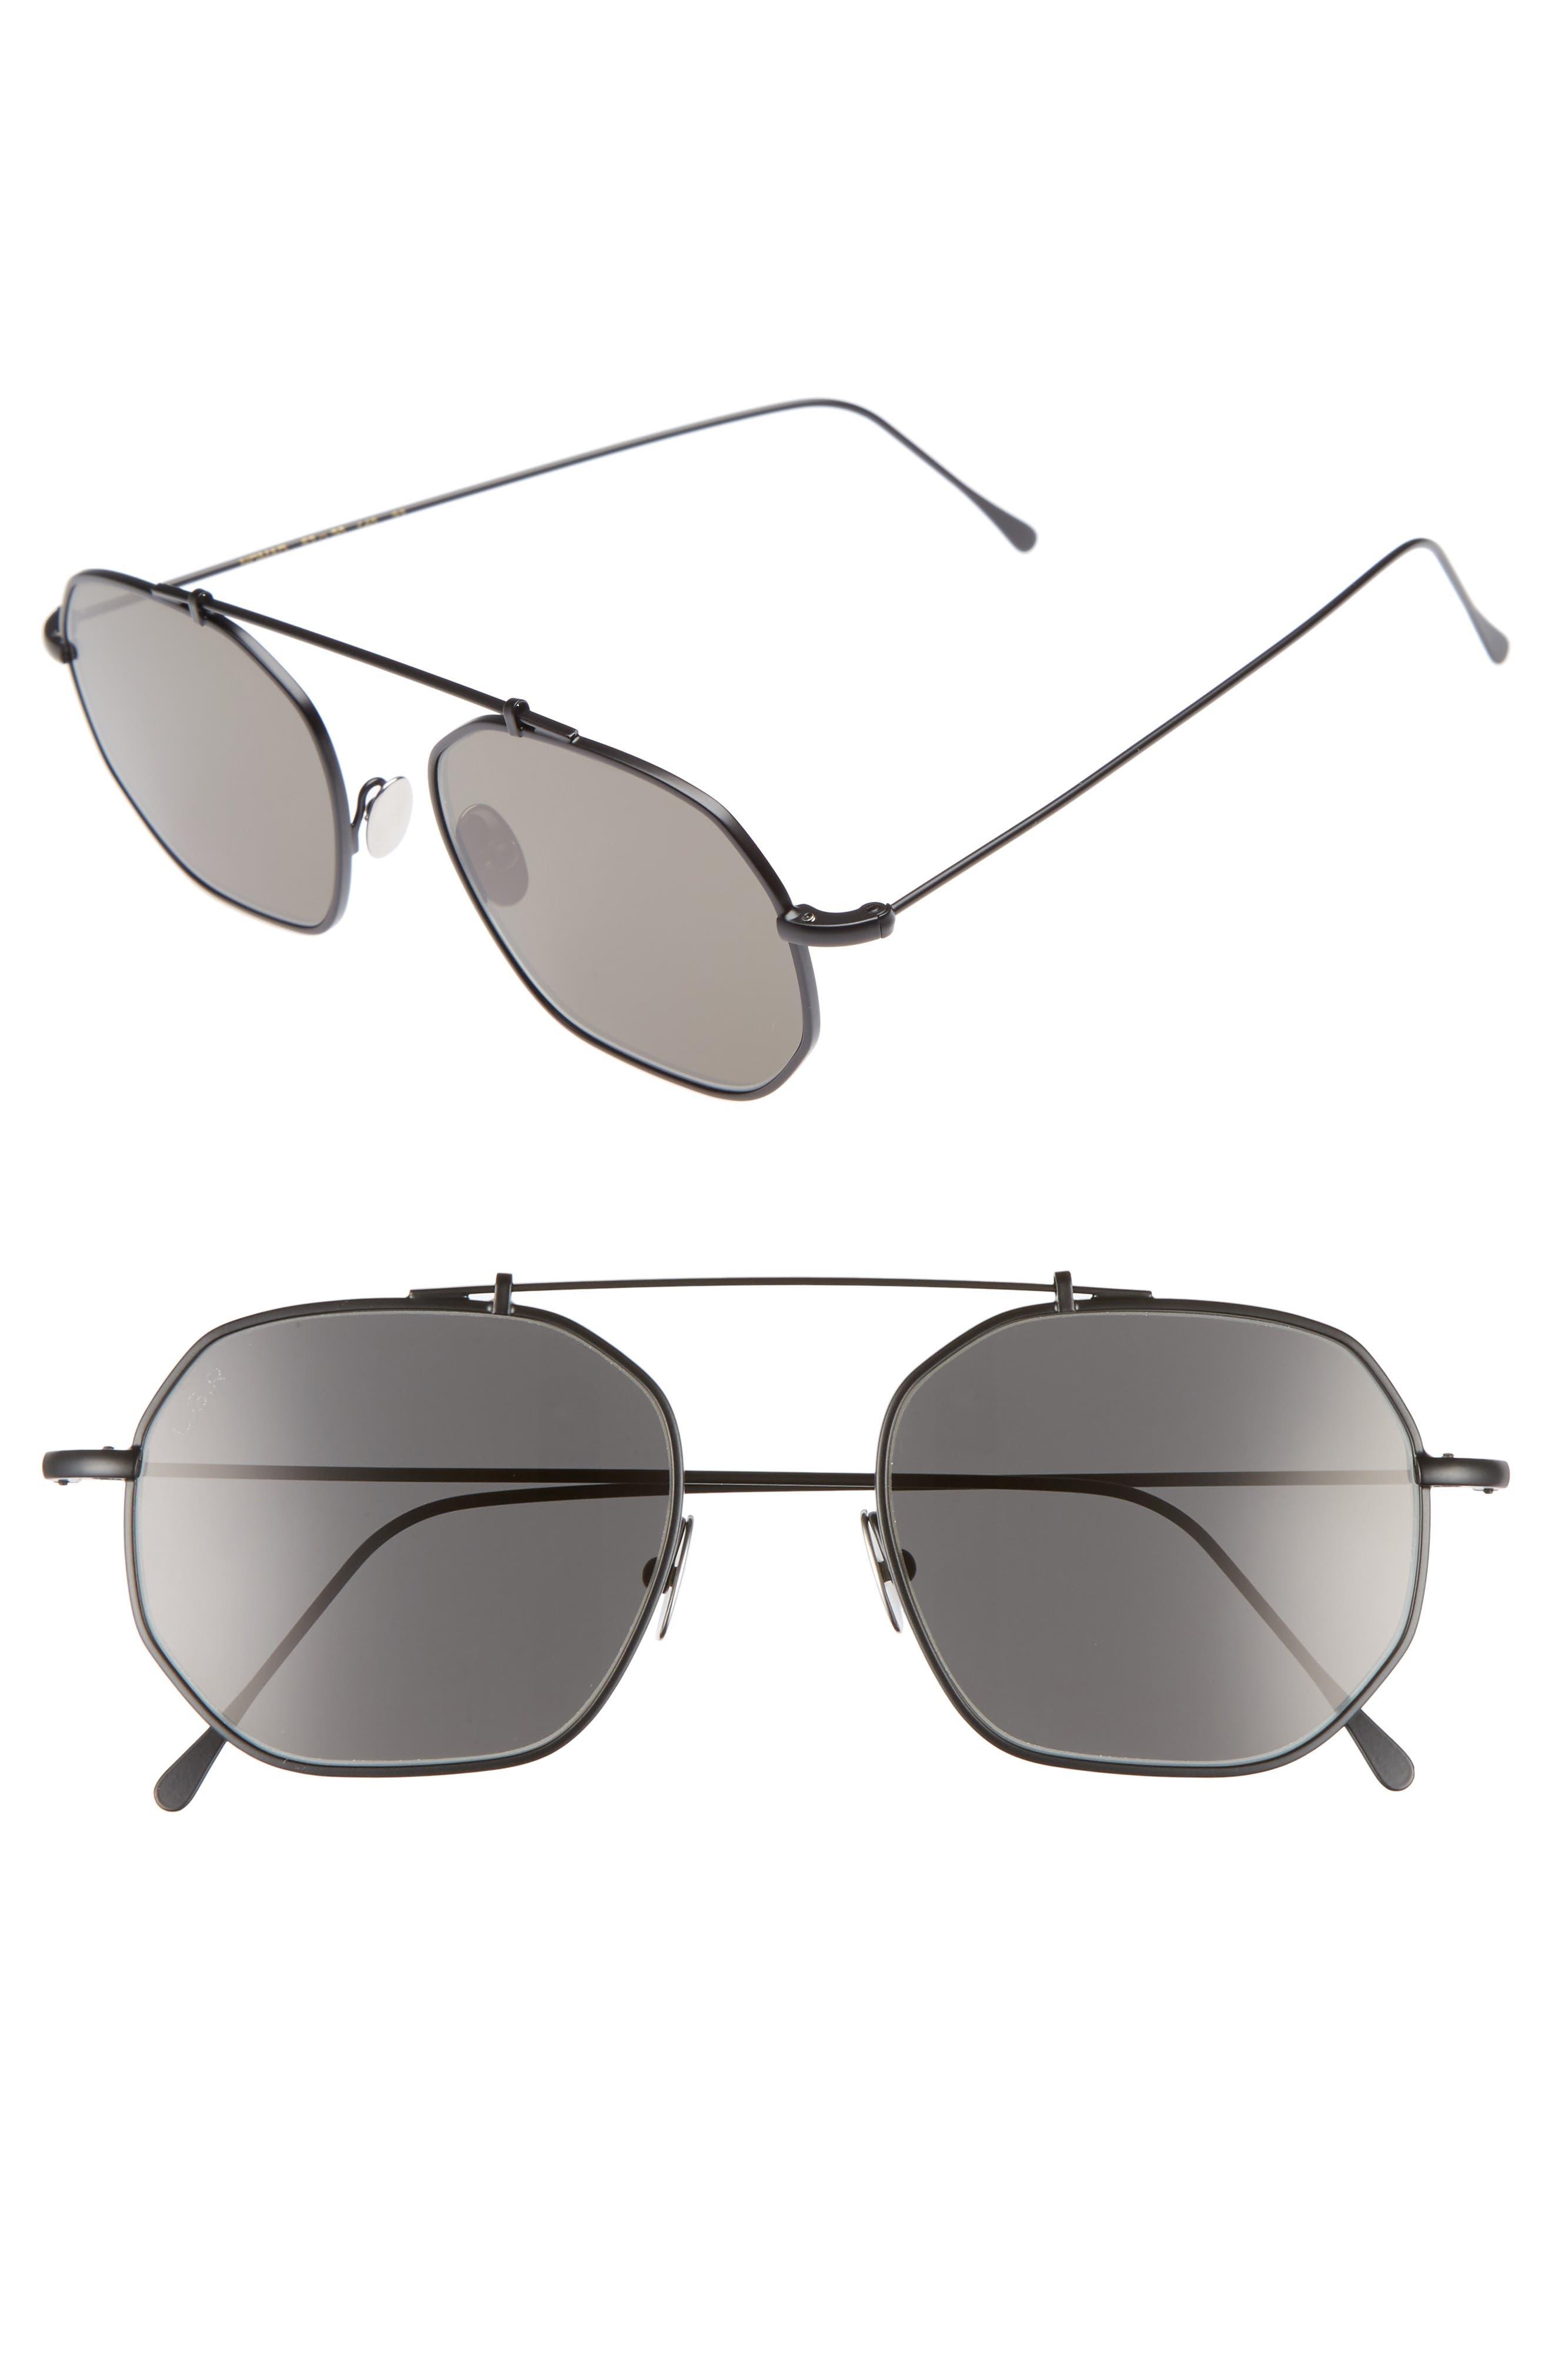 Nomad 52mm Sunglasses,                         Main,                         color, 001